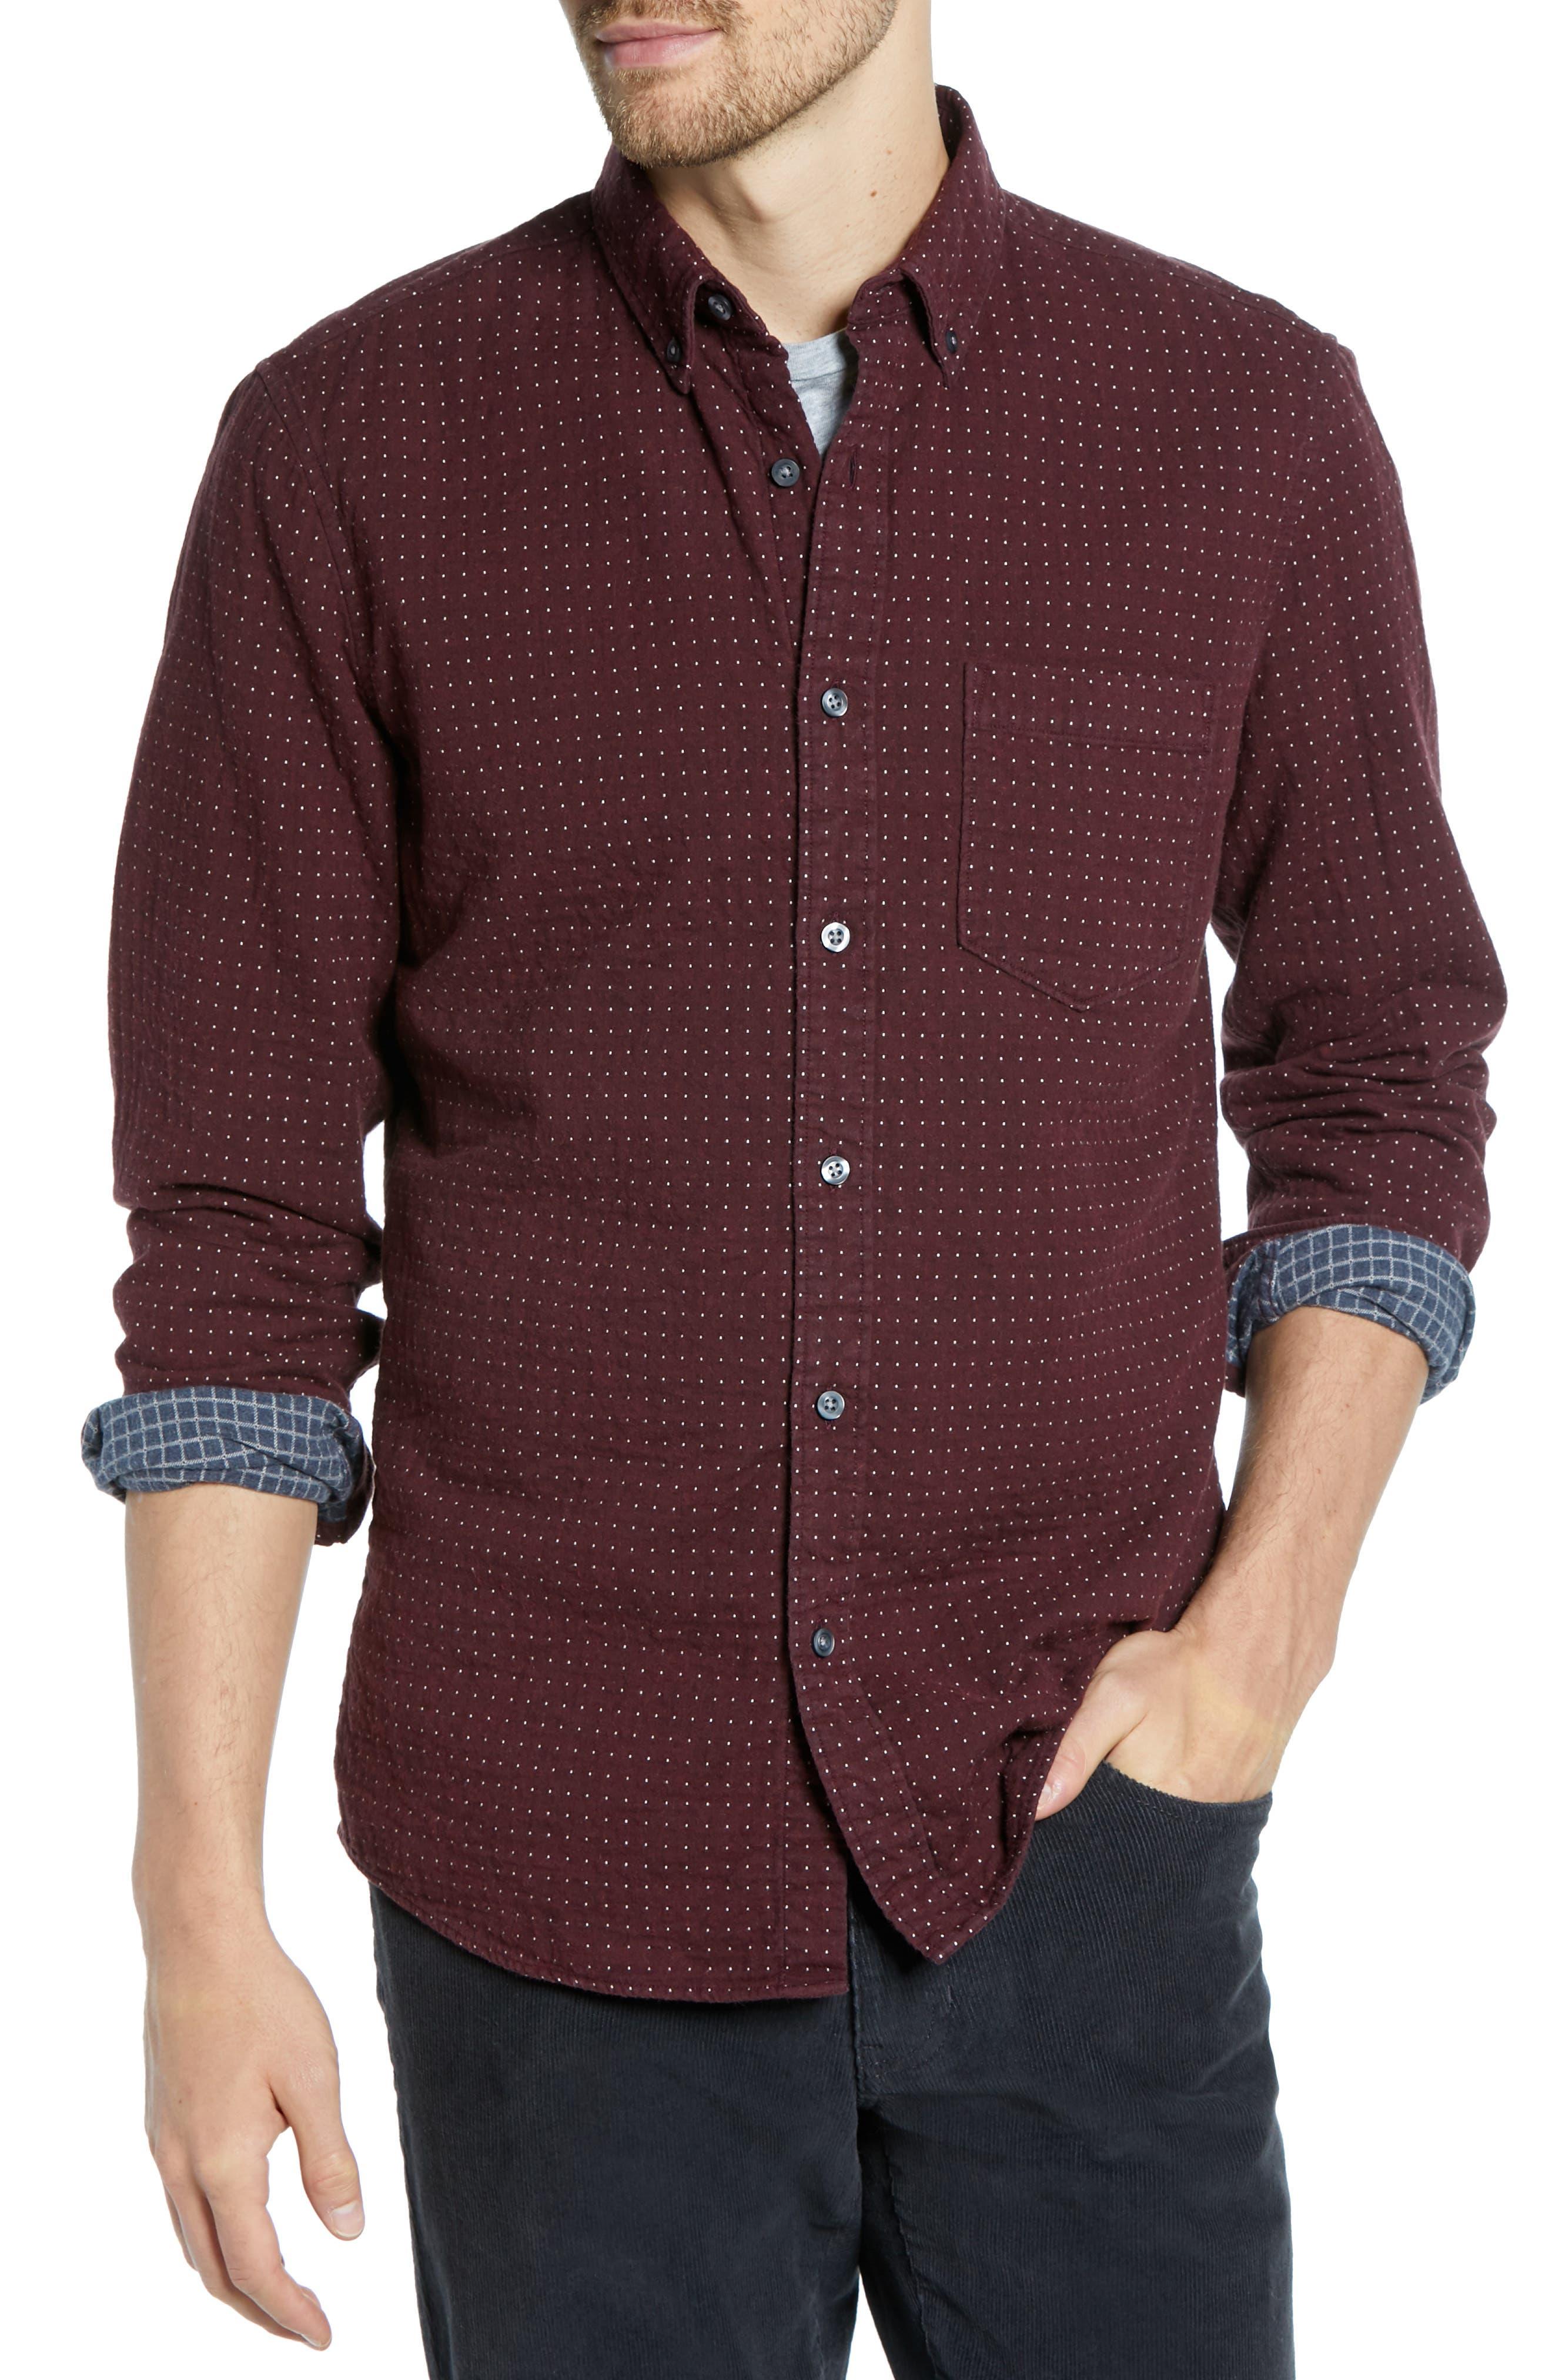 Trim Fit Dot Flannel Sport Shirt,                             Main thumbnail 1, color,                             BURGUNDY ROYALE GREY DUOFOLD